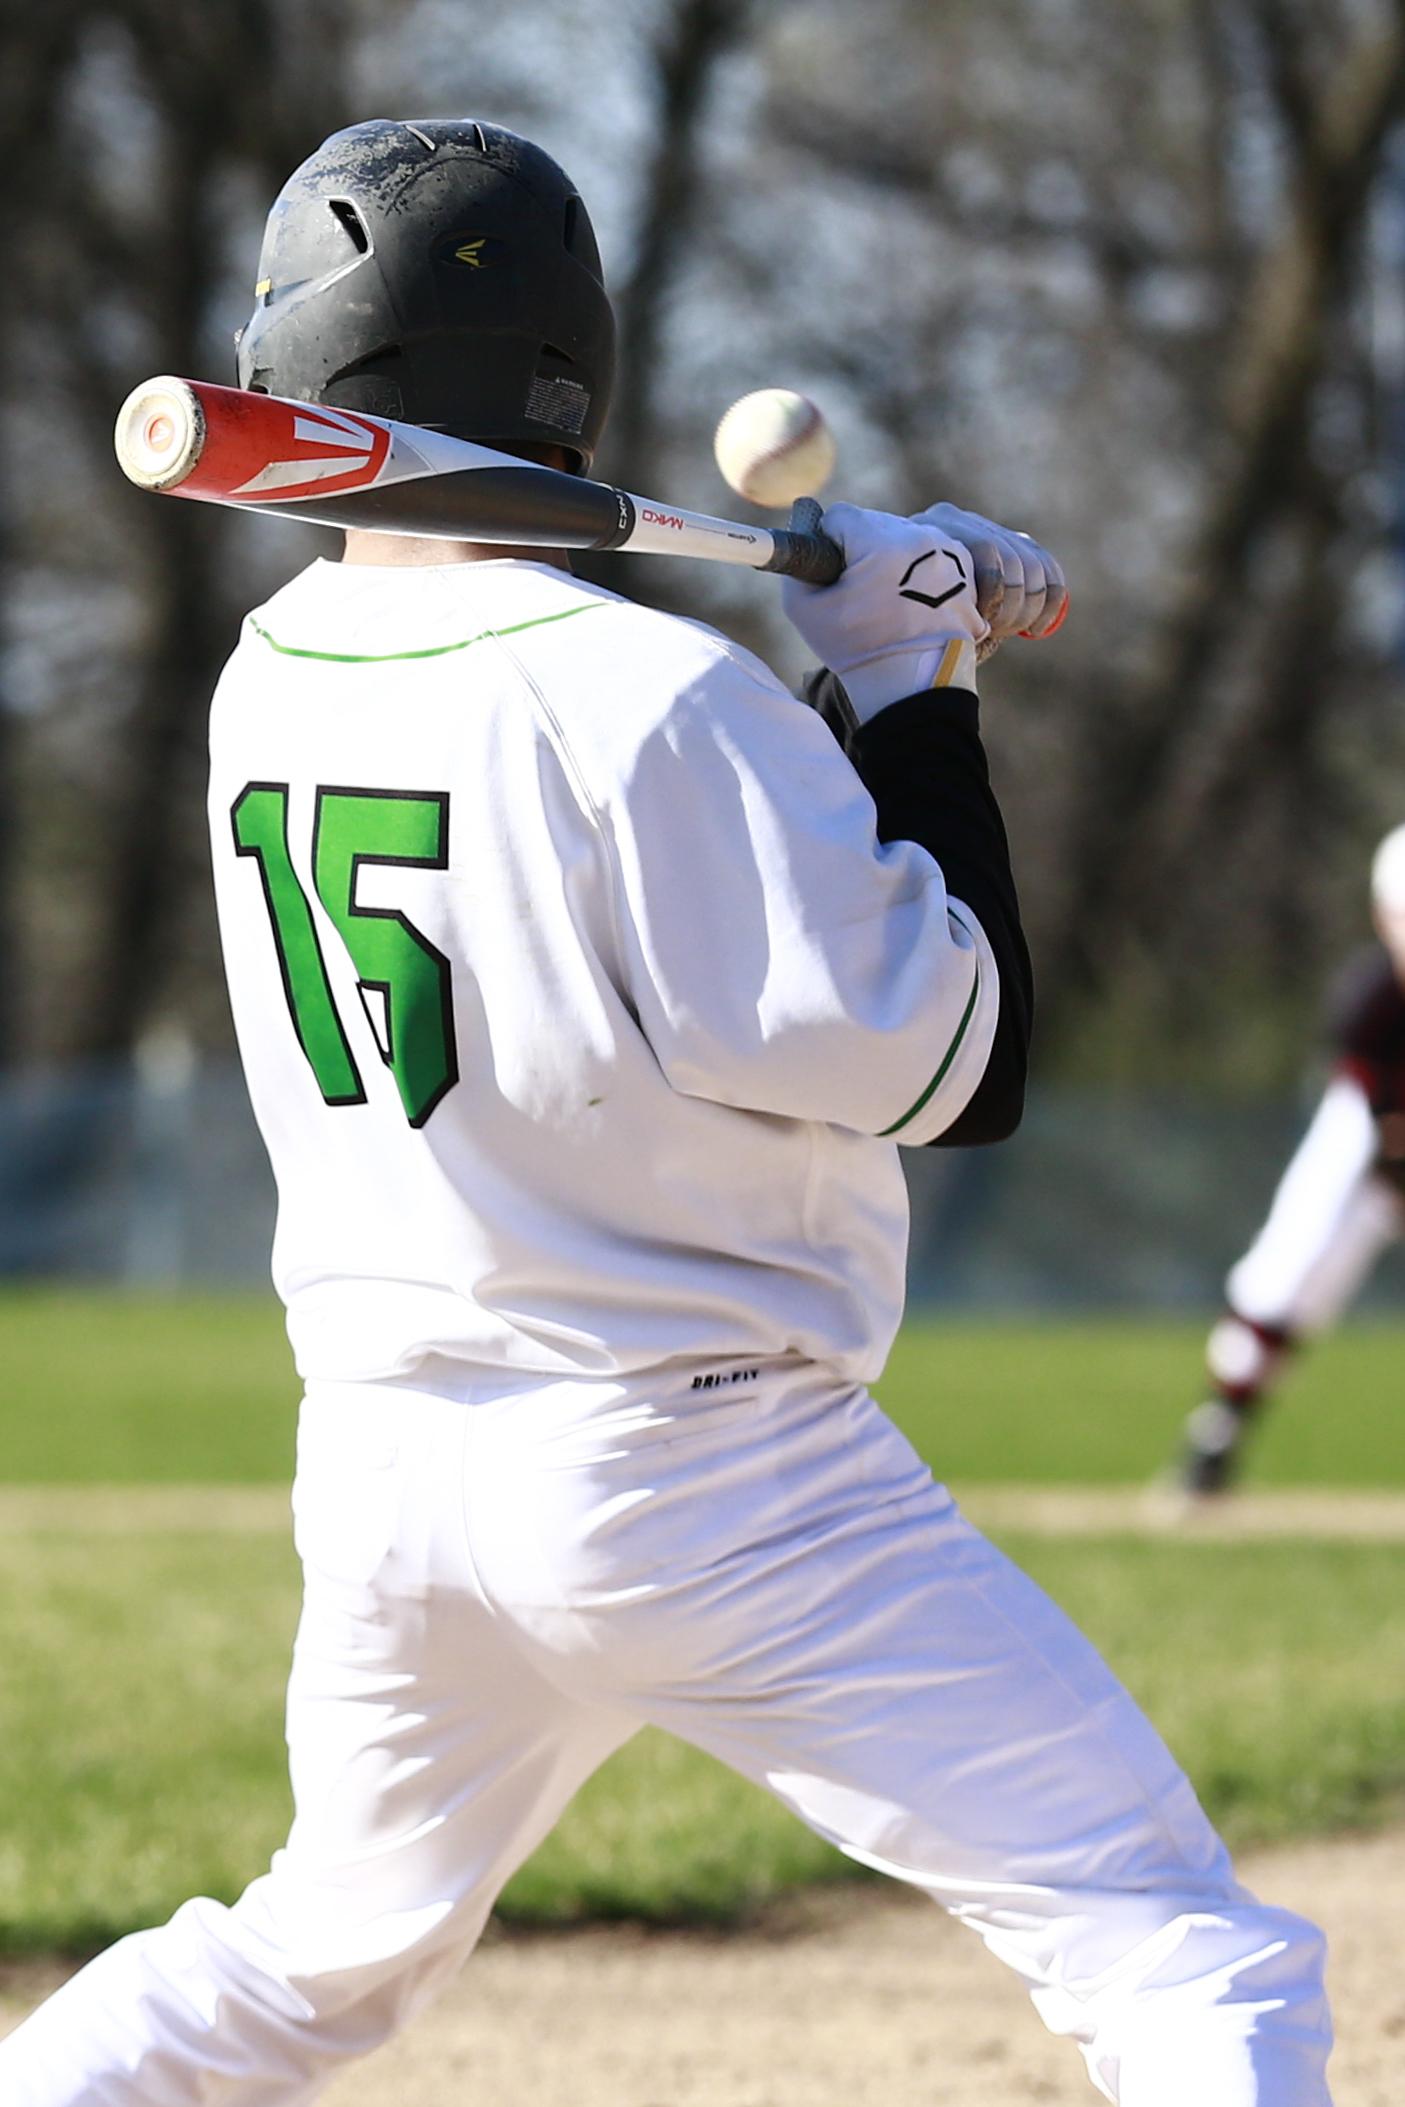 Jacob Chenitz (15) of Blake at bat. Photo by Chris Juhn